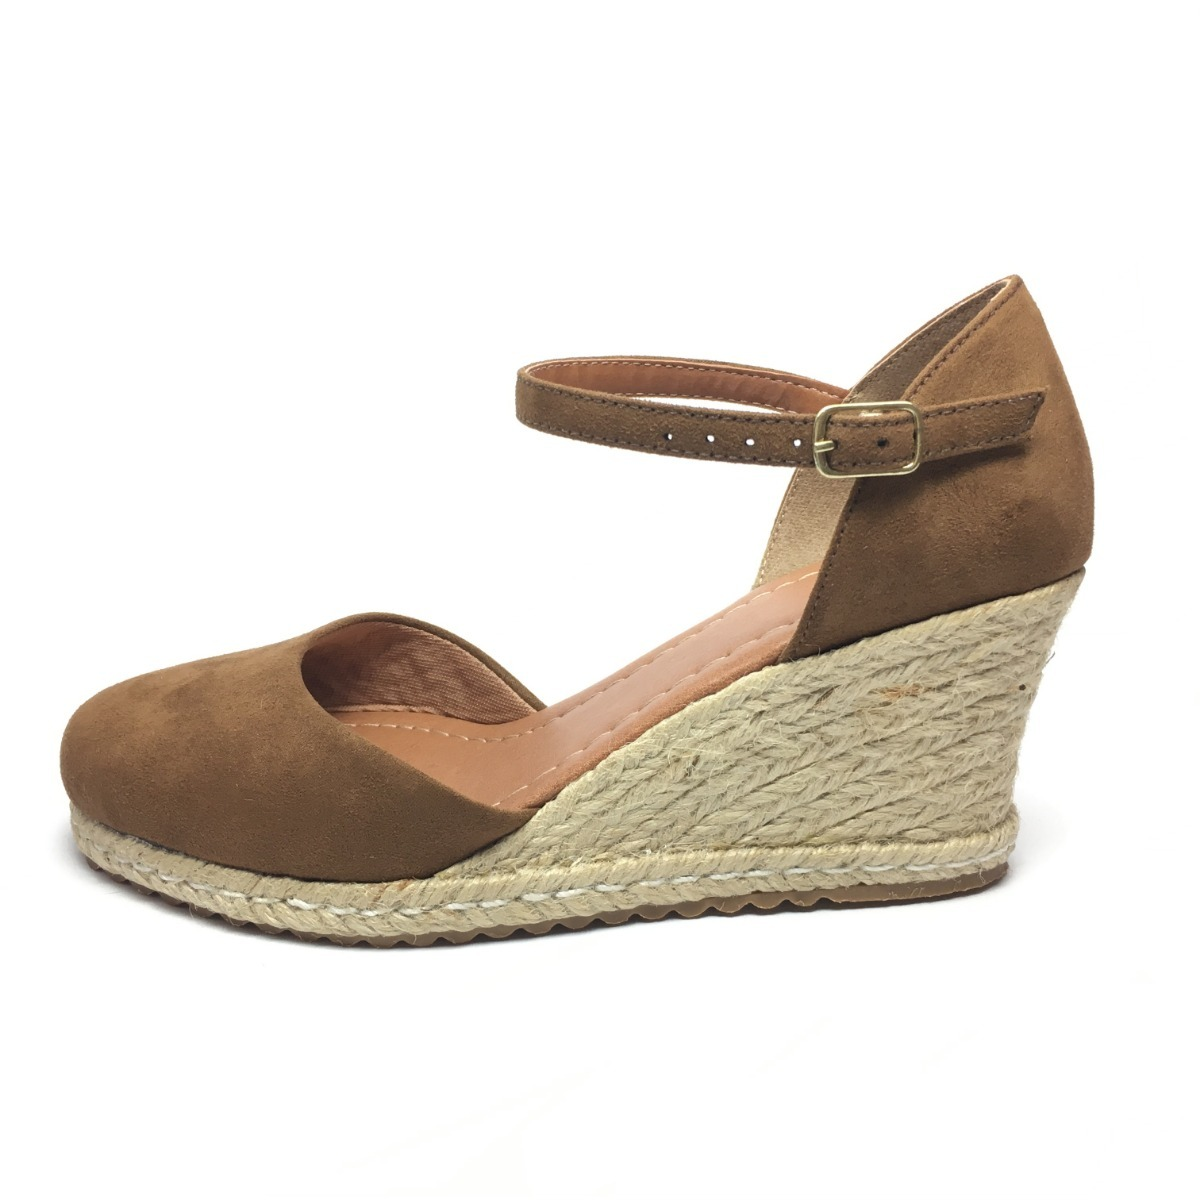 1283be776 sandália anabela feminina espadrille salto médio nude linda! Carregando  zoom.